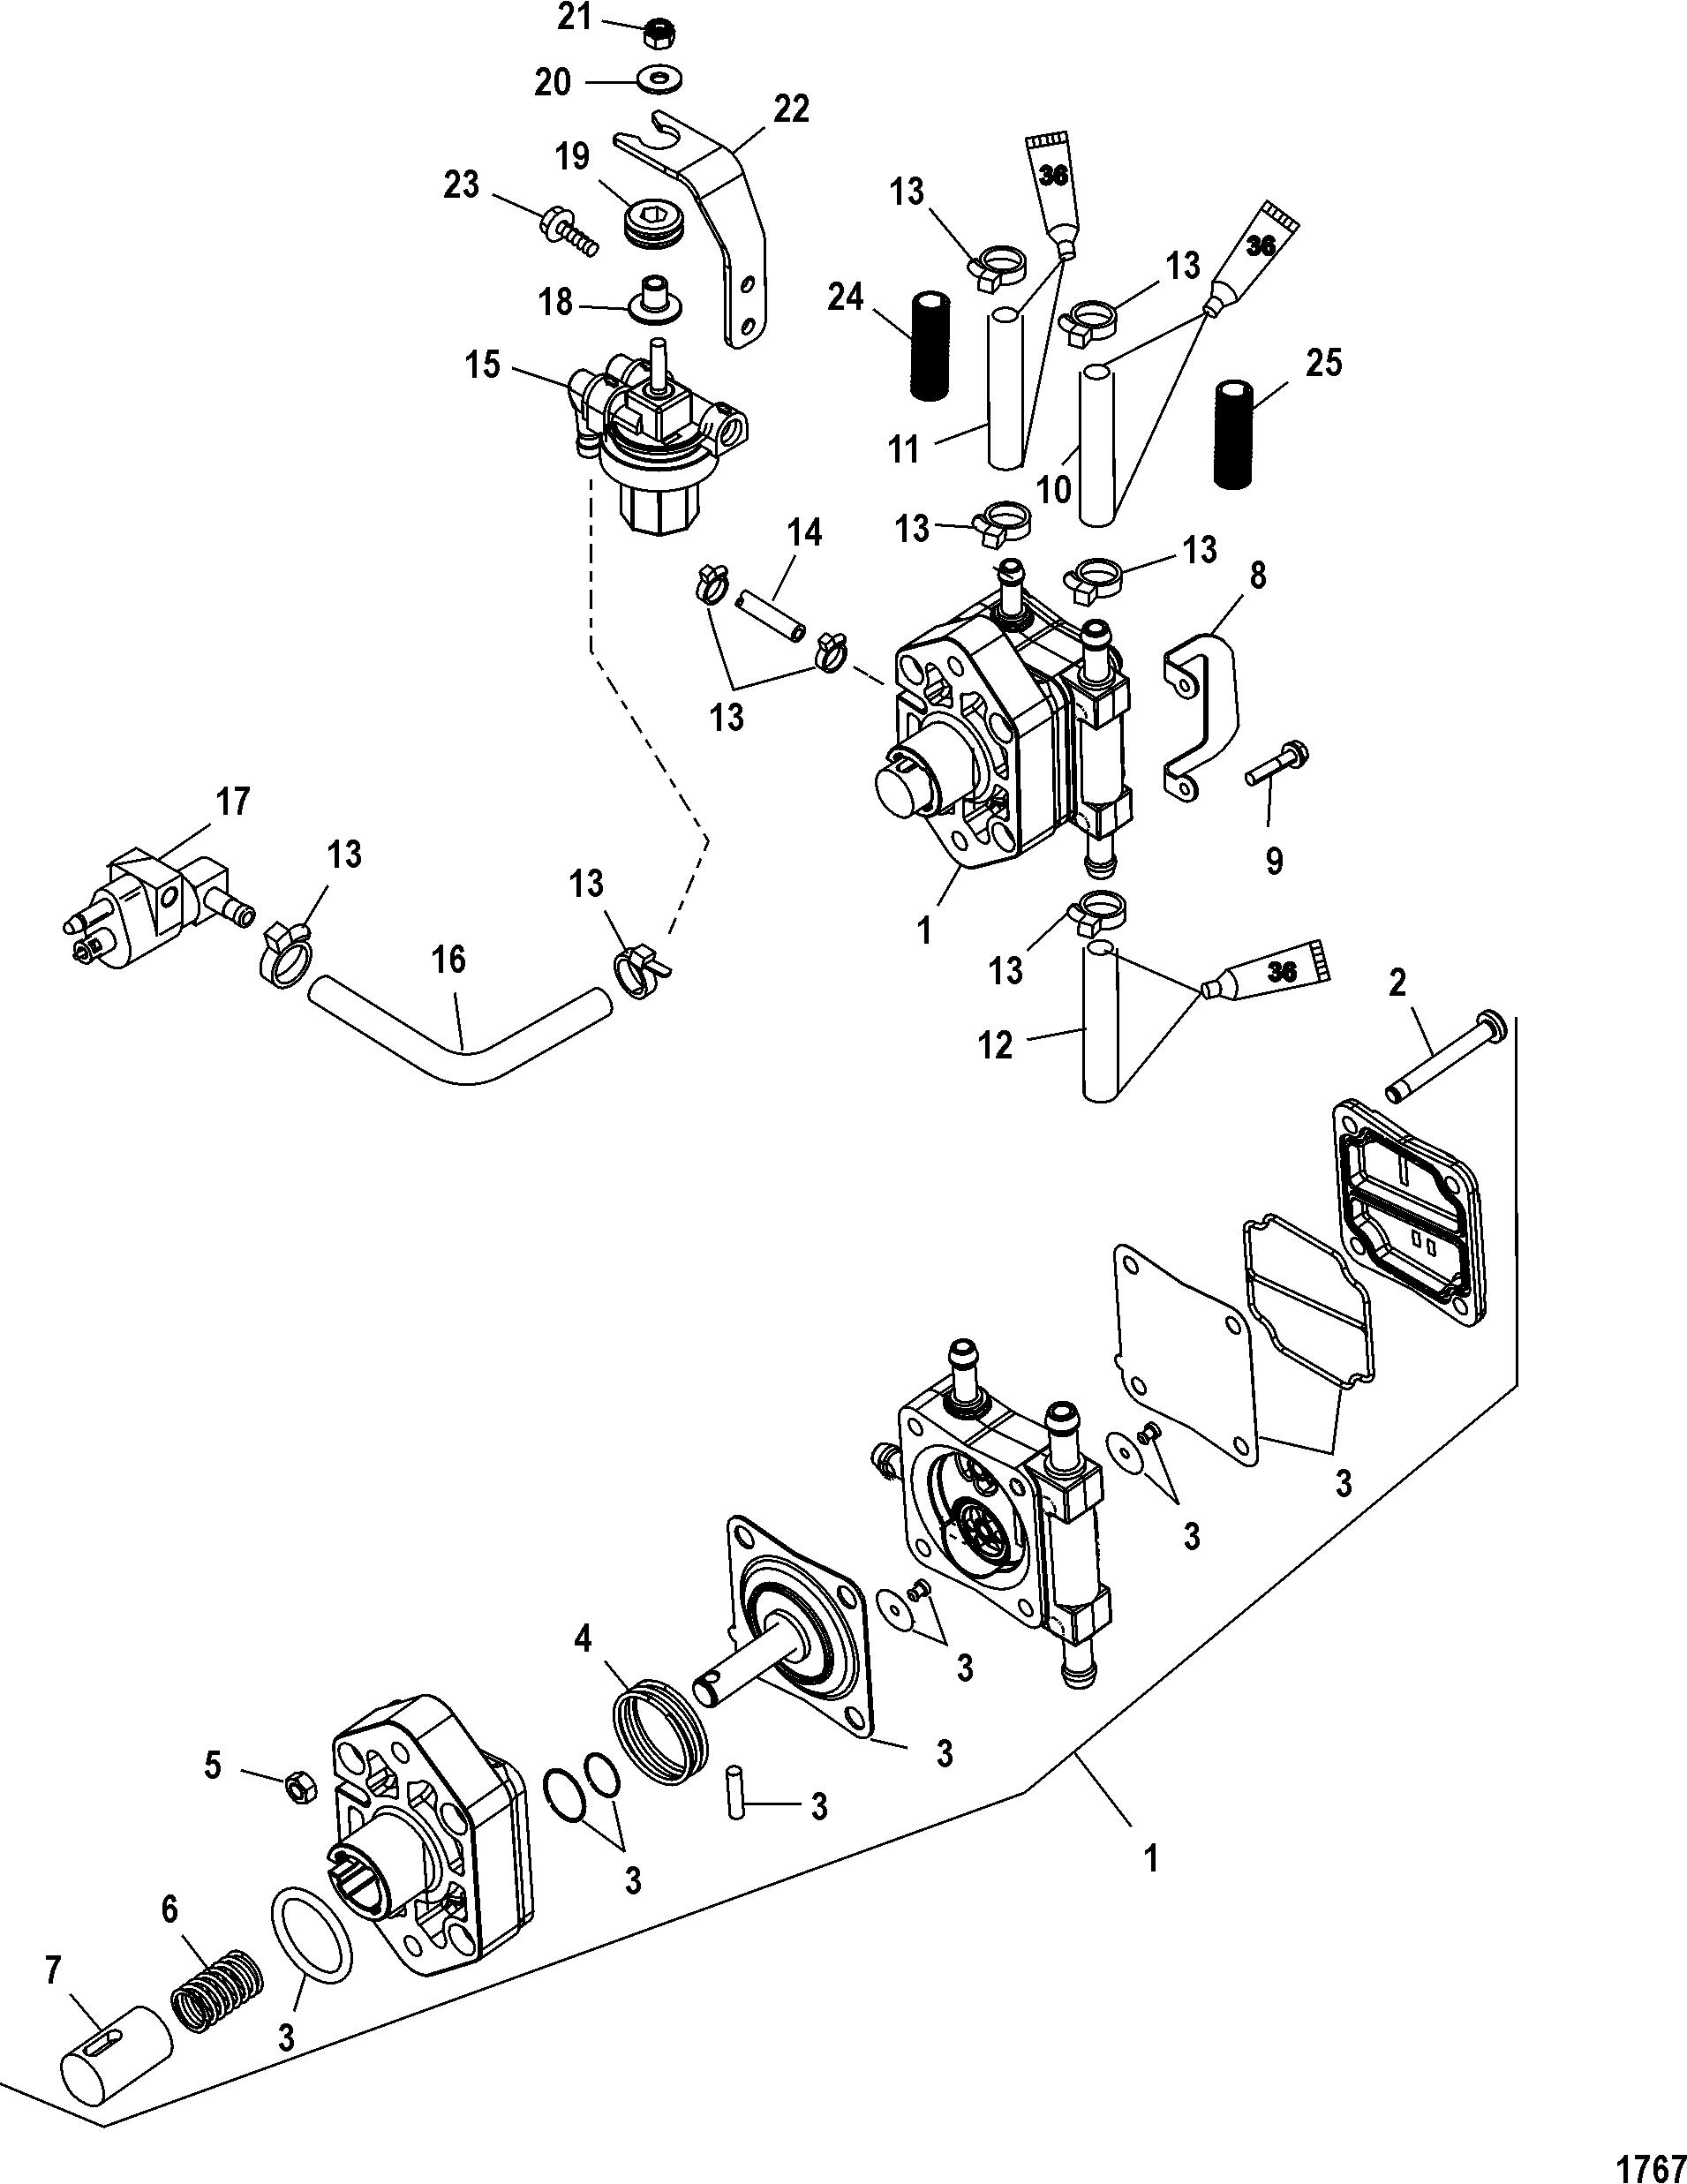 Mercruiser Trim Gauge Wiring Diagram Details | Avecdd Unix on